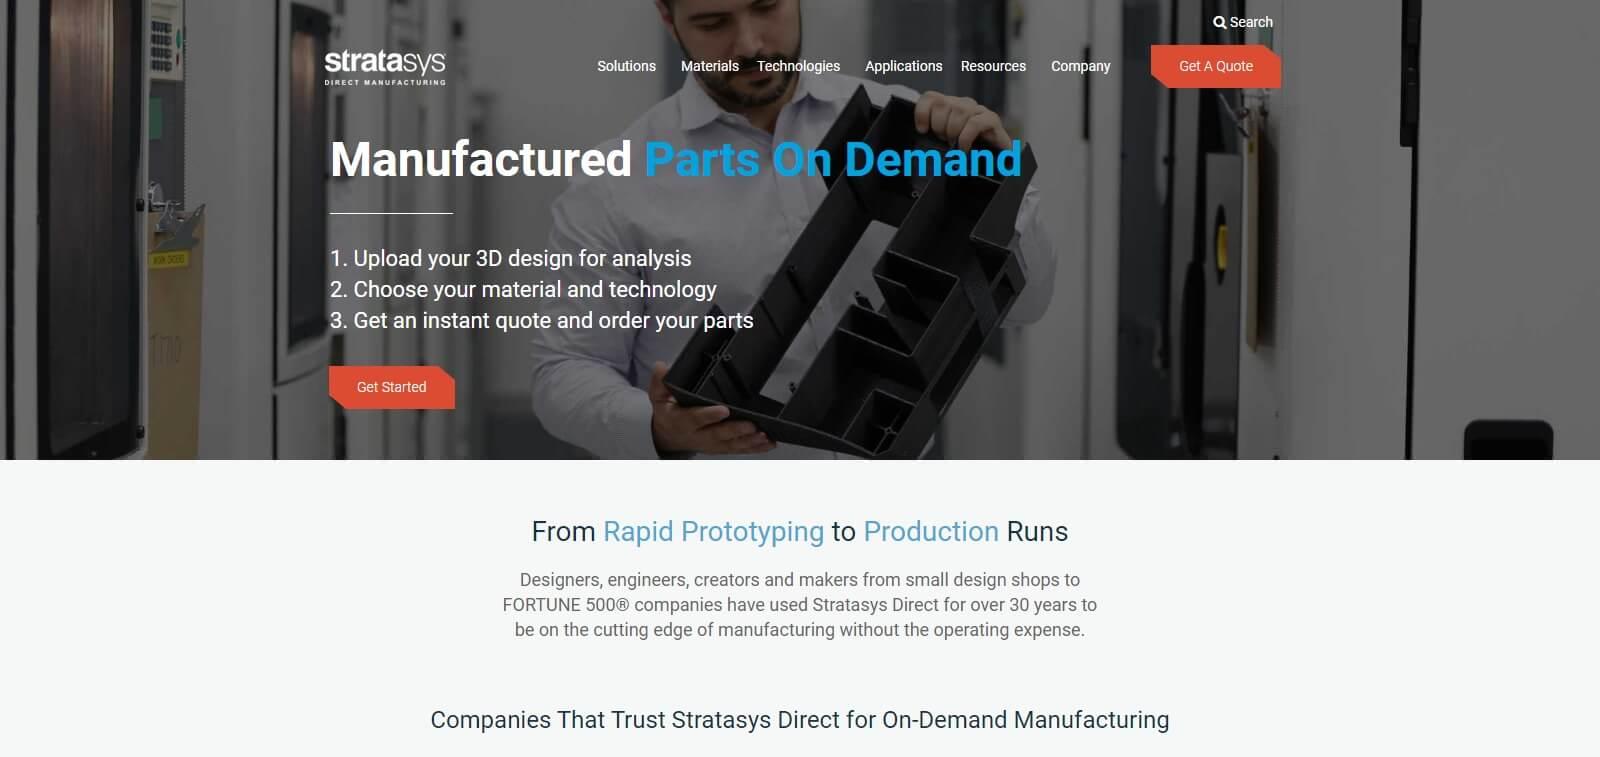 Stratasys Direct_ Manufactured Parts On Demand - www.stratasysdirect.com